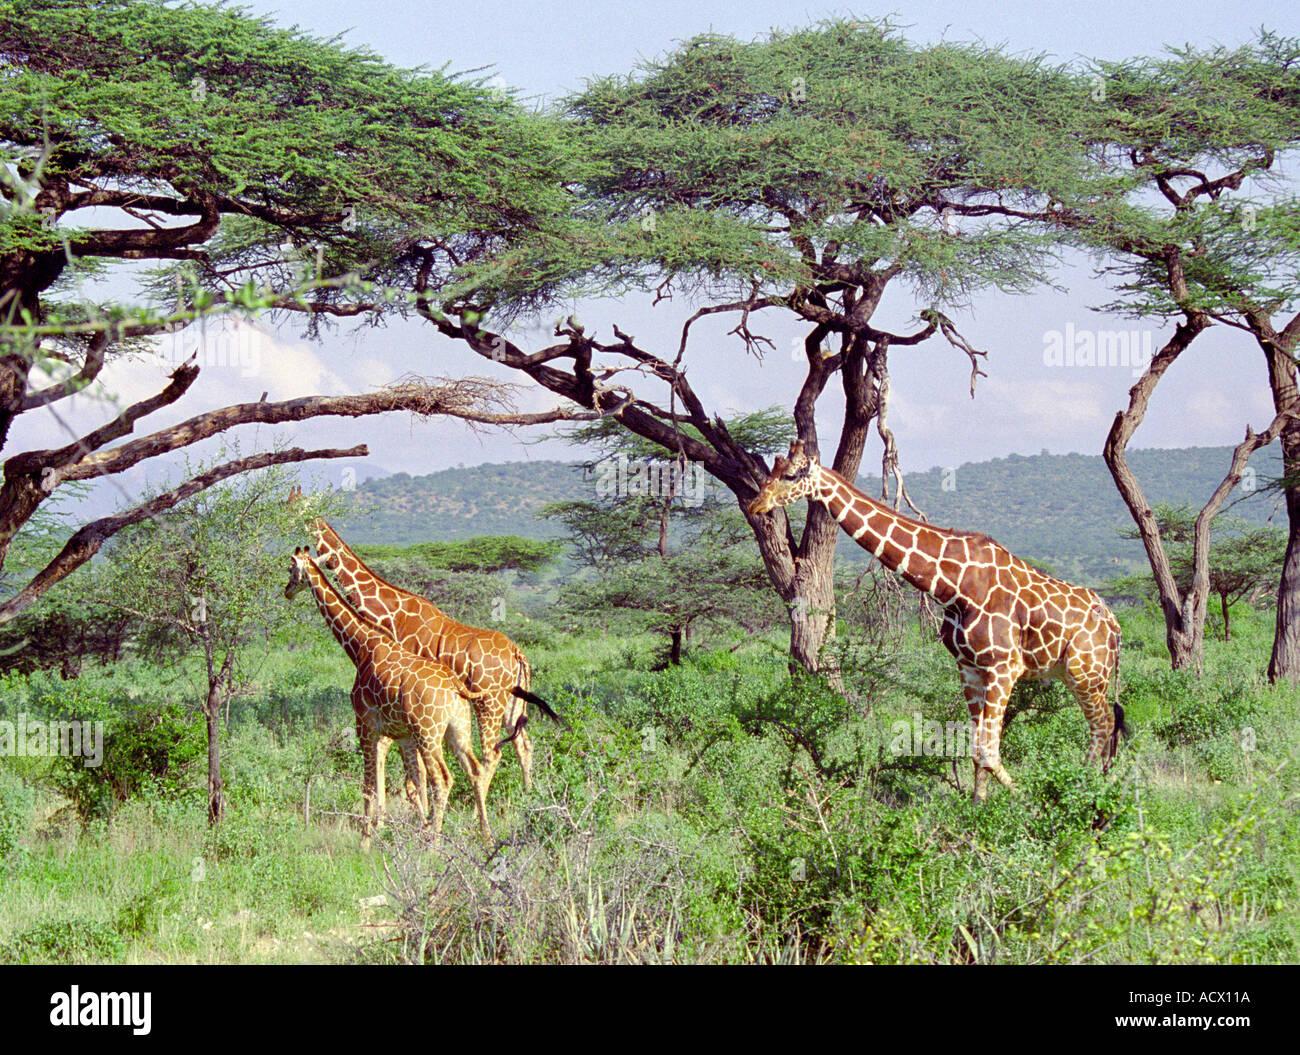 Rothschild Giraffe, Giraffa camelopardalis rothschildi, Giraffidae - Stock Image